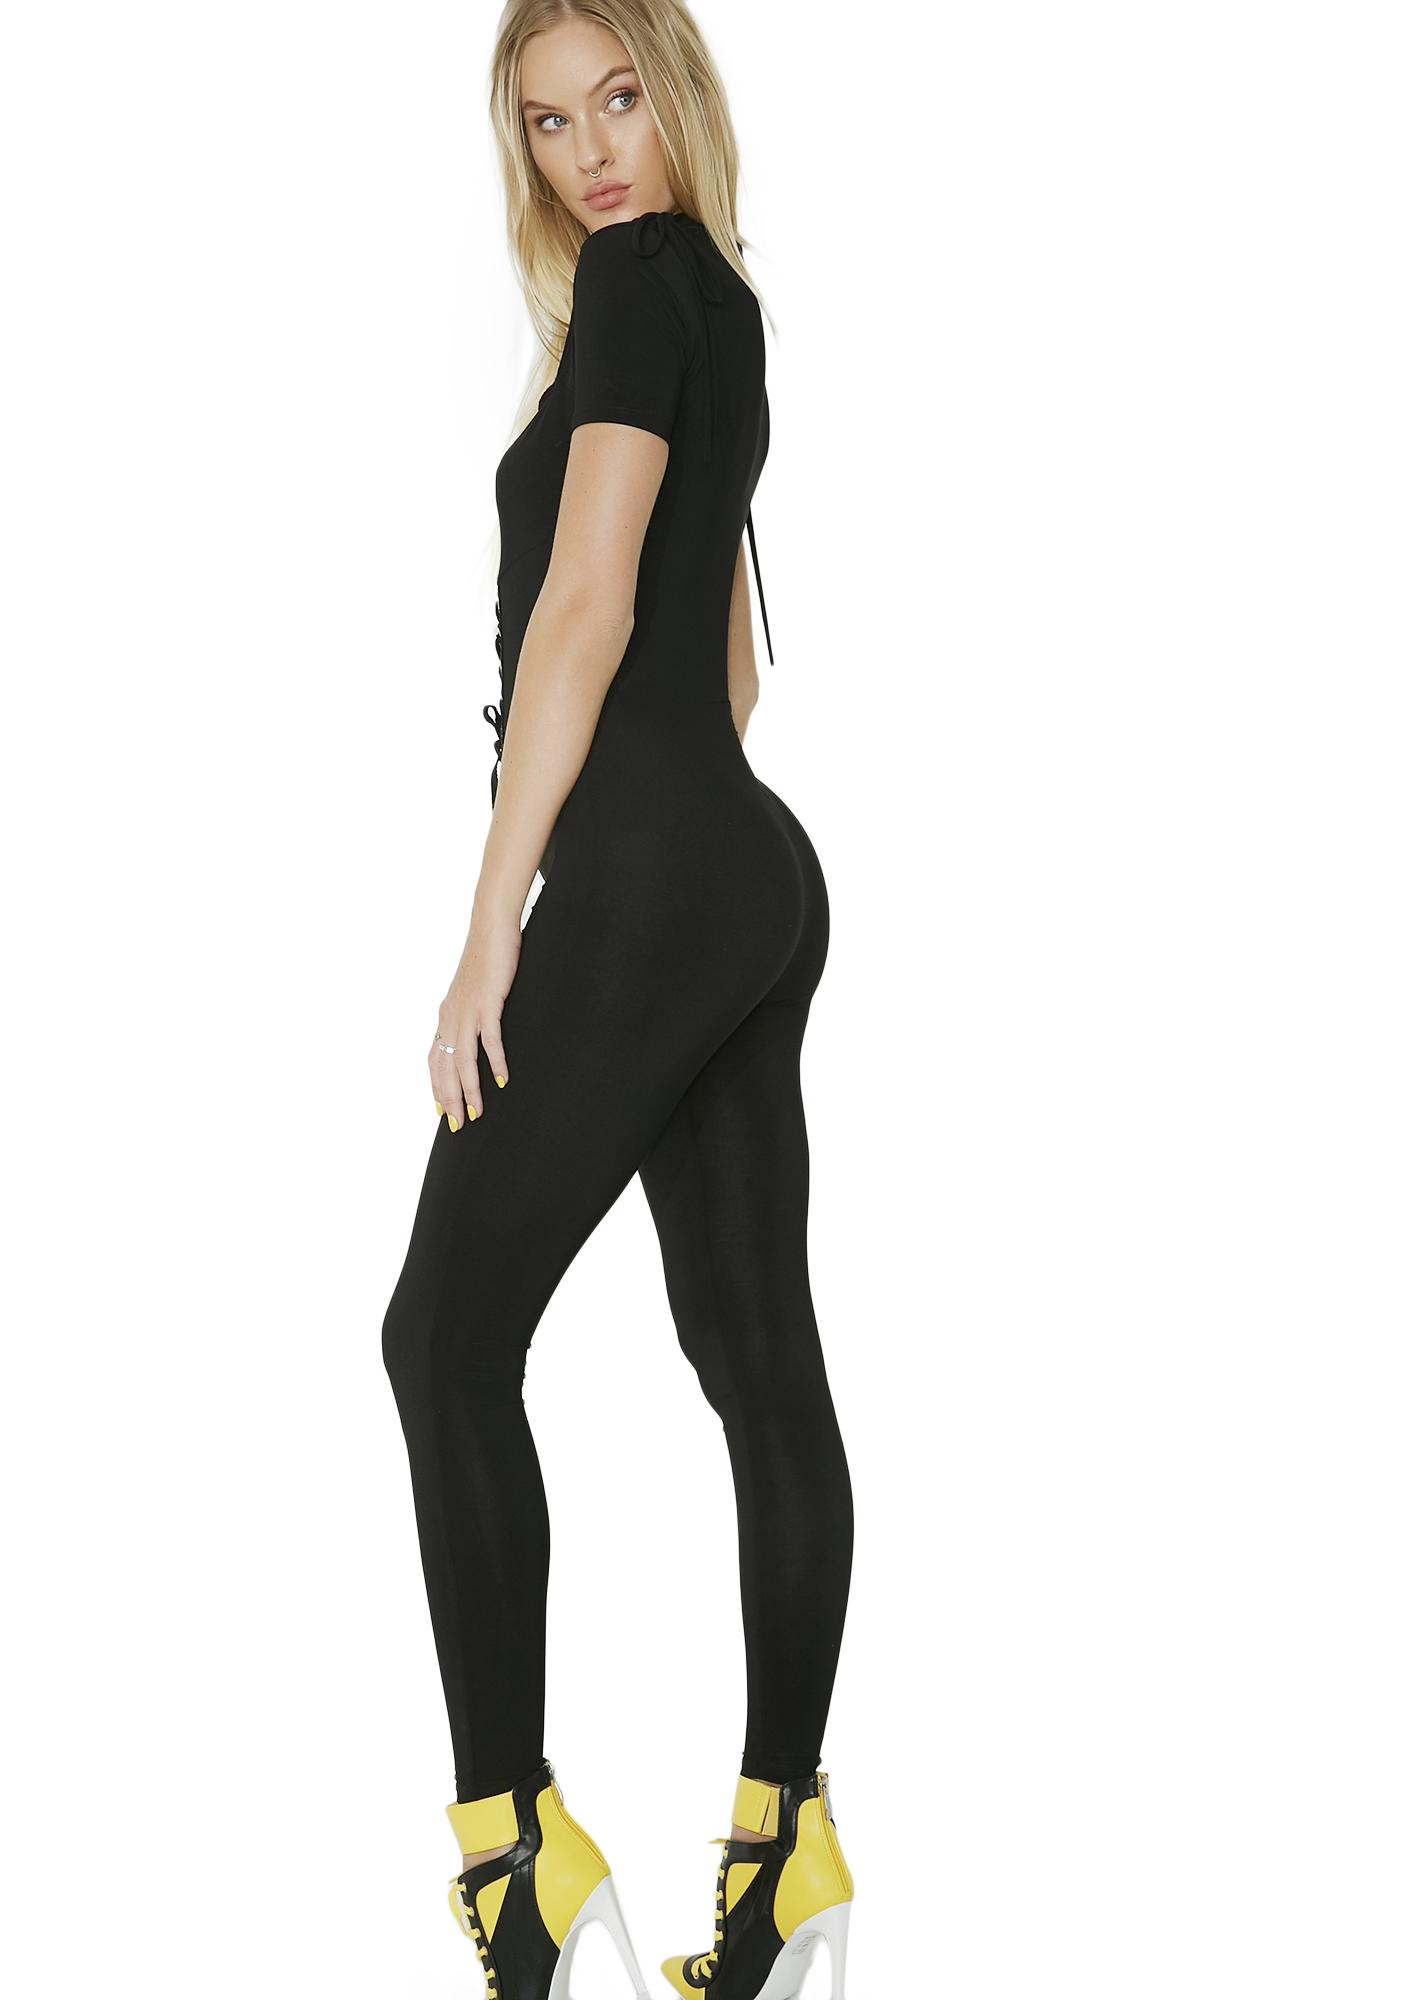 Miss Mayhem Corset Bodysuit